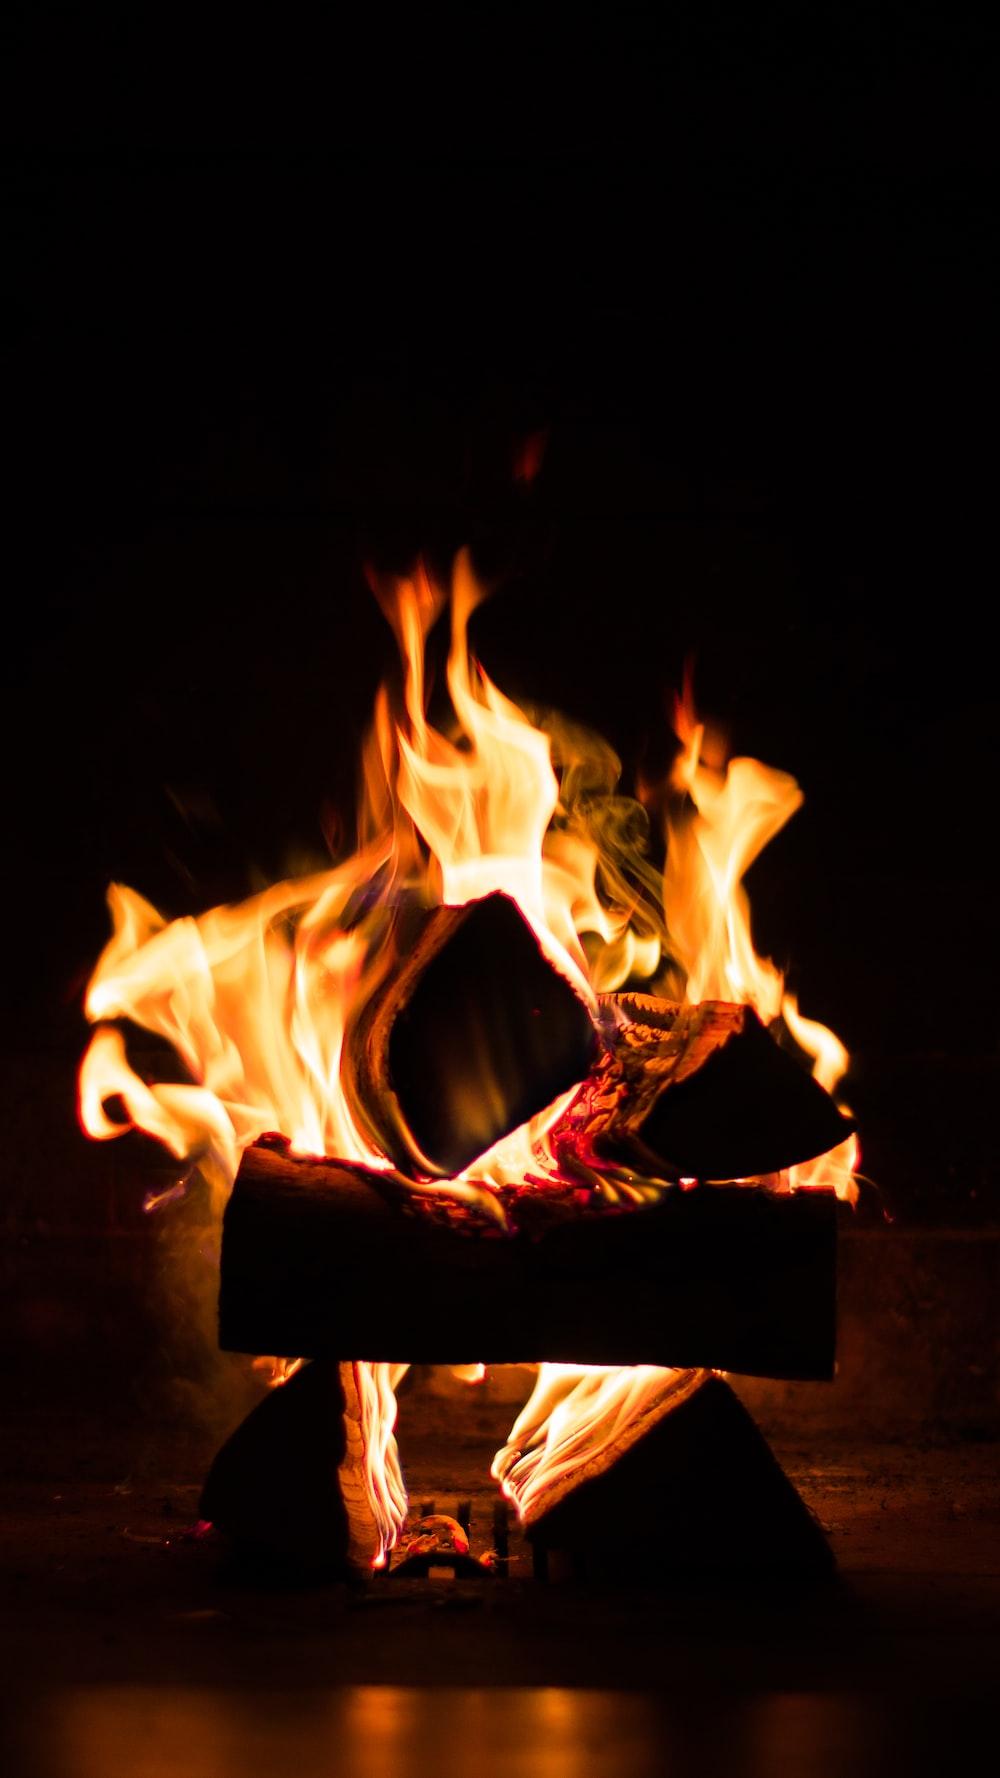 bon fire close-up photography